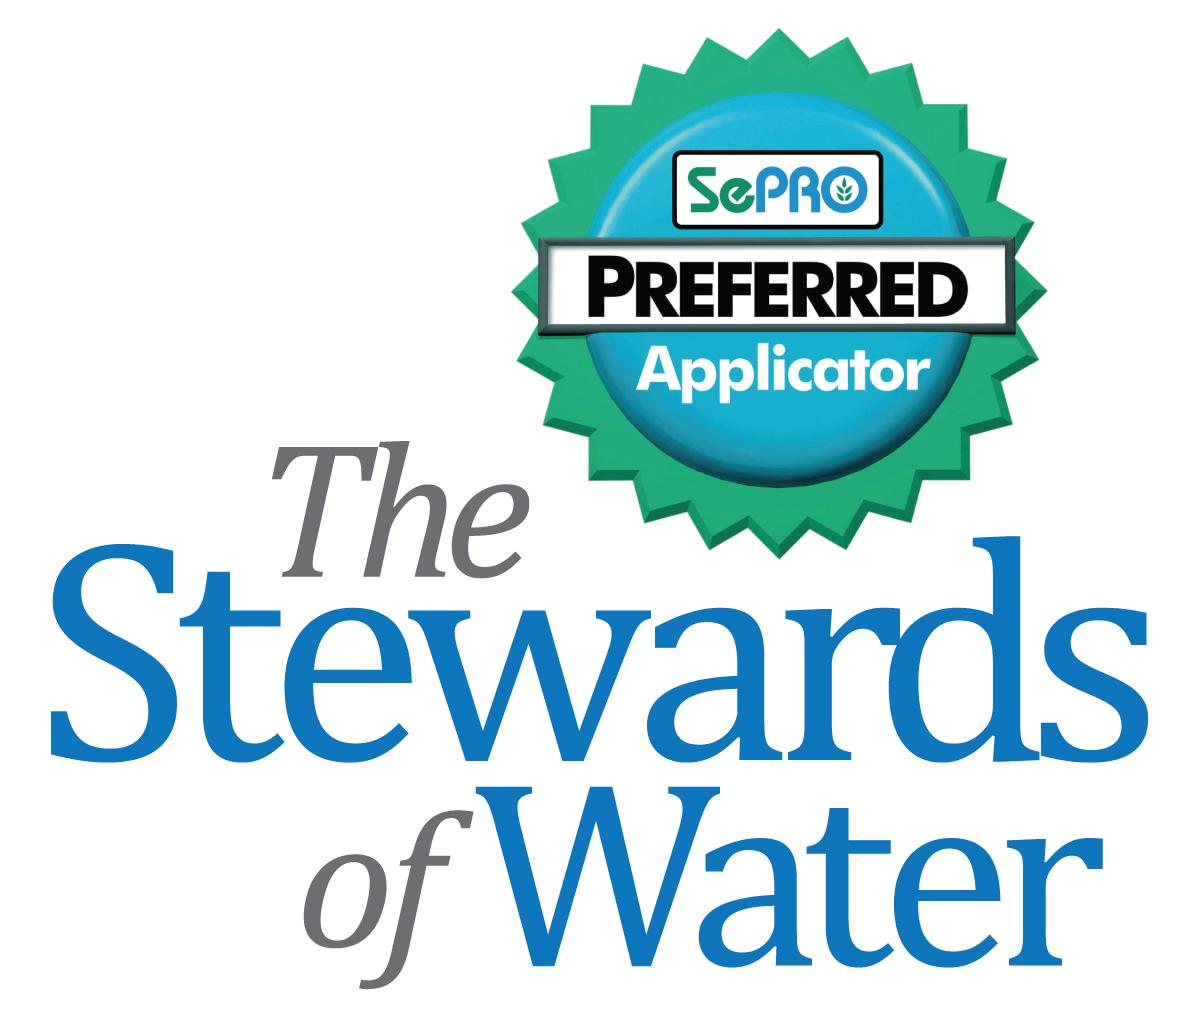 SePRO Stewards of Water logo